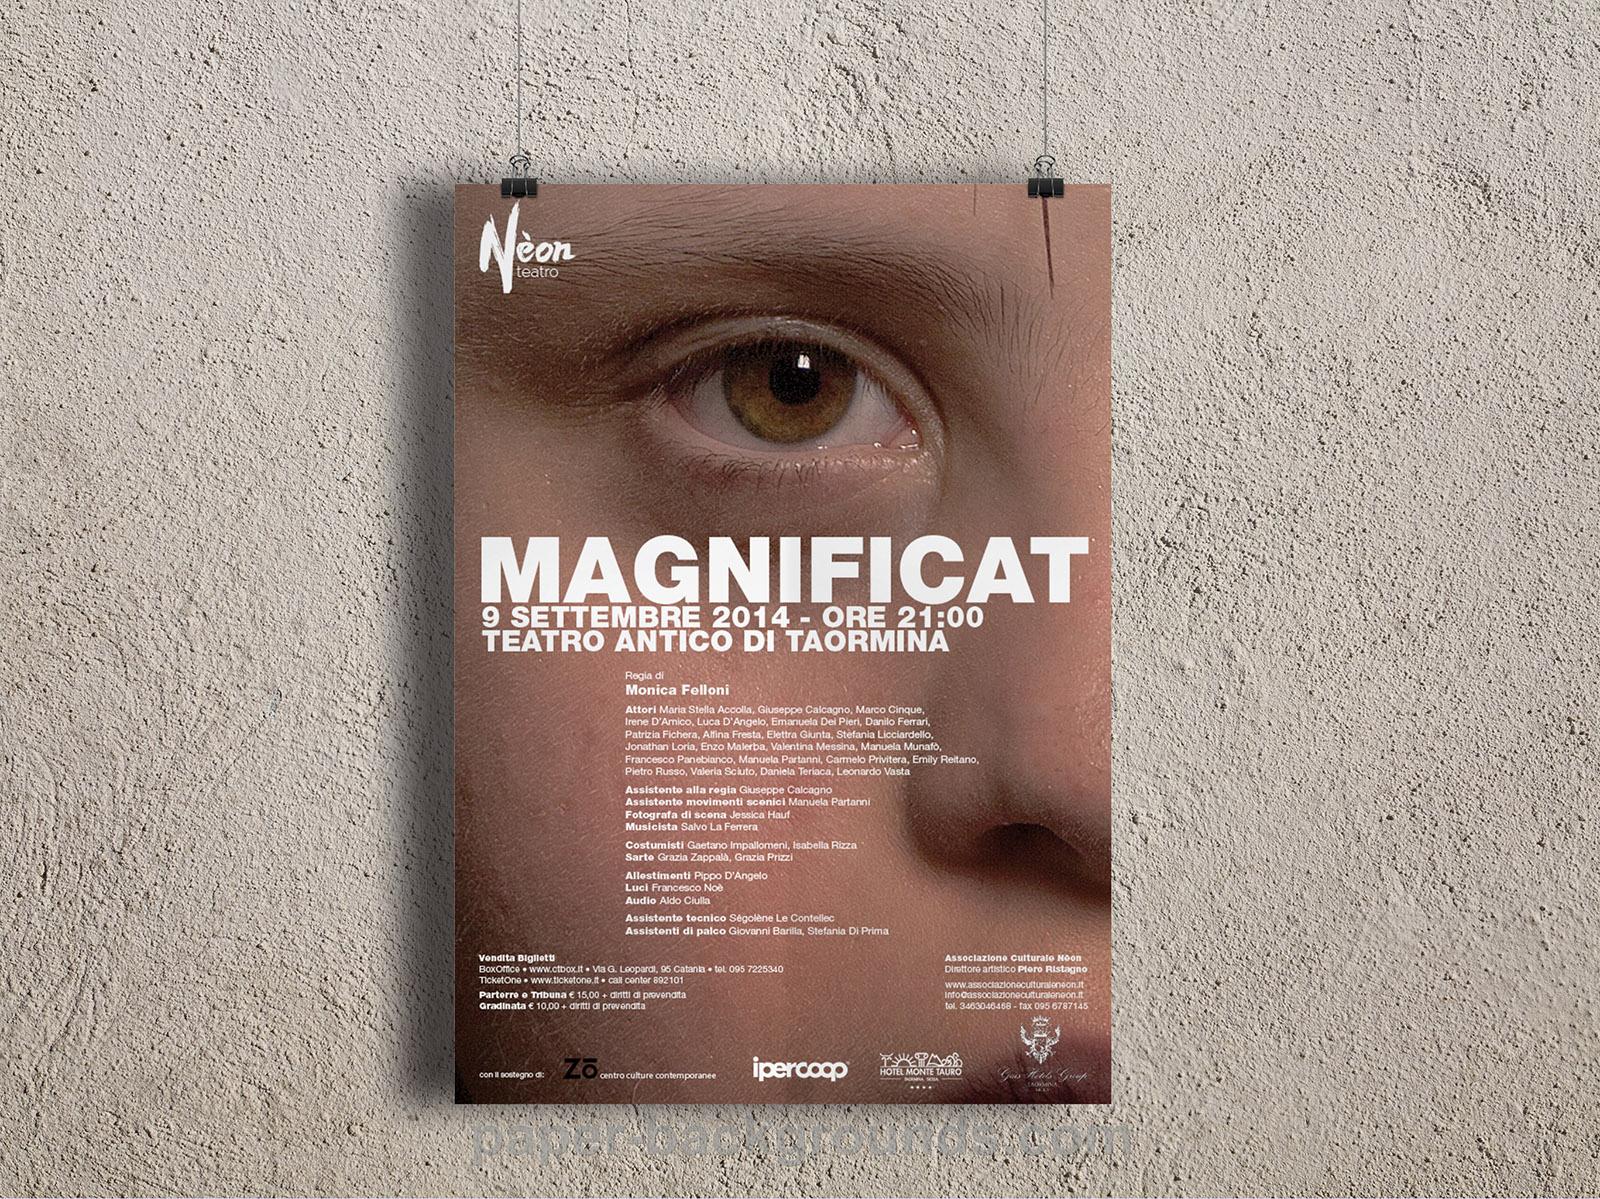 neon_poster_magnificat